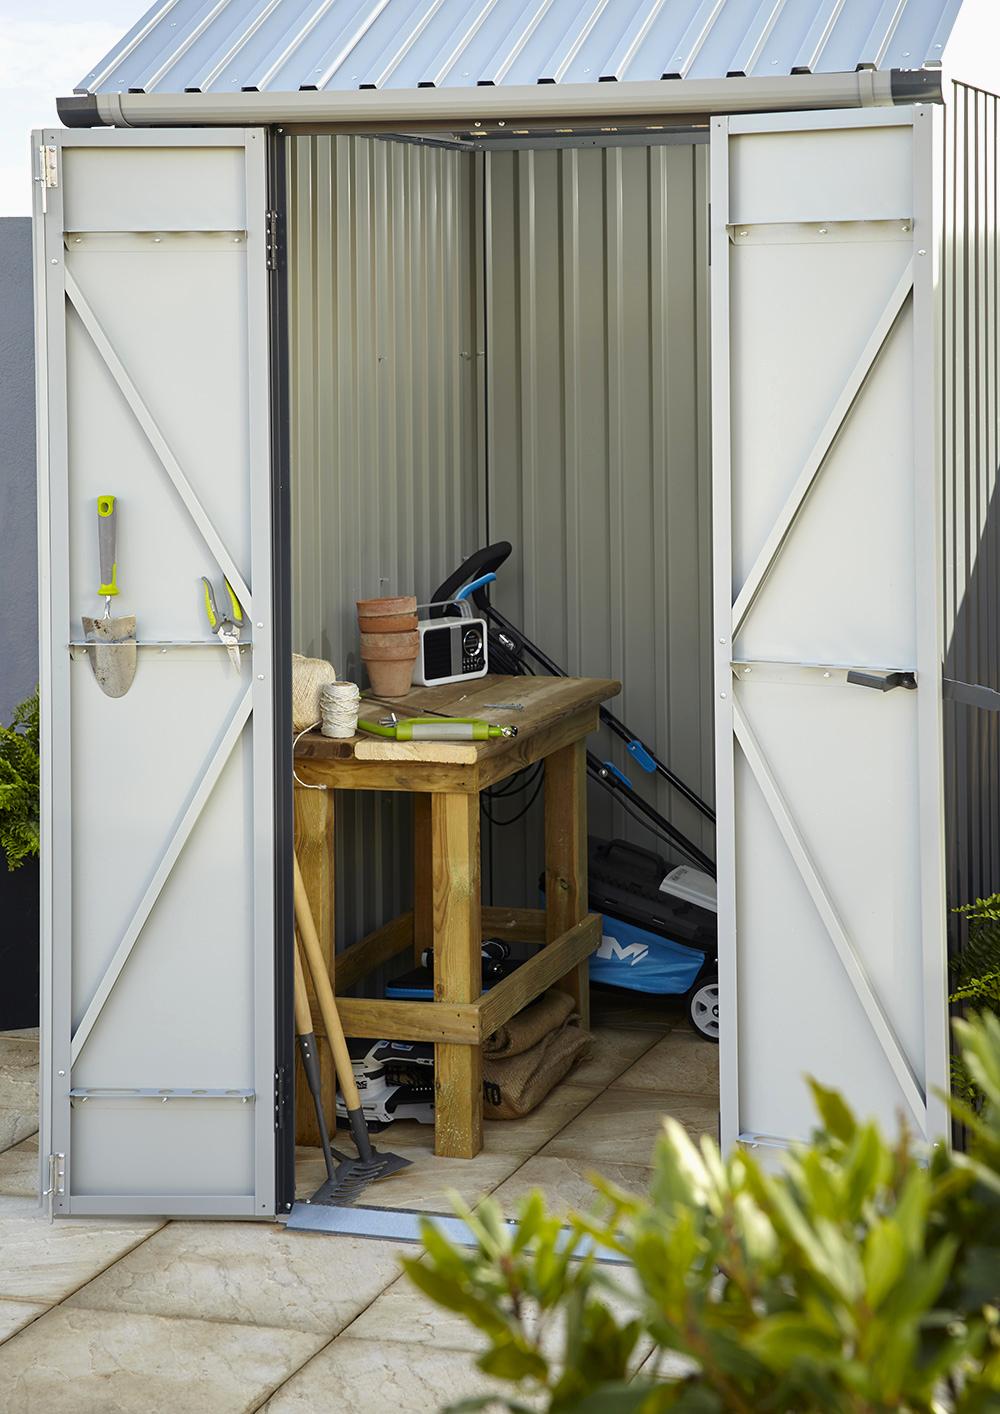 Abri De Jardin Permis De Construire Charmant Abri De Jardin Boite A Outils Idées Abris Castorama Dossier